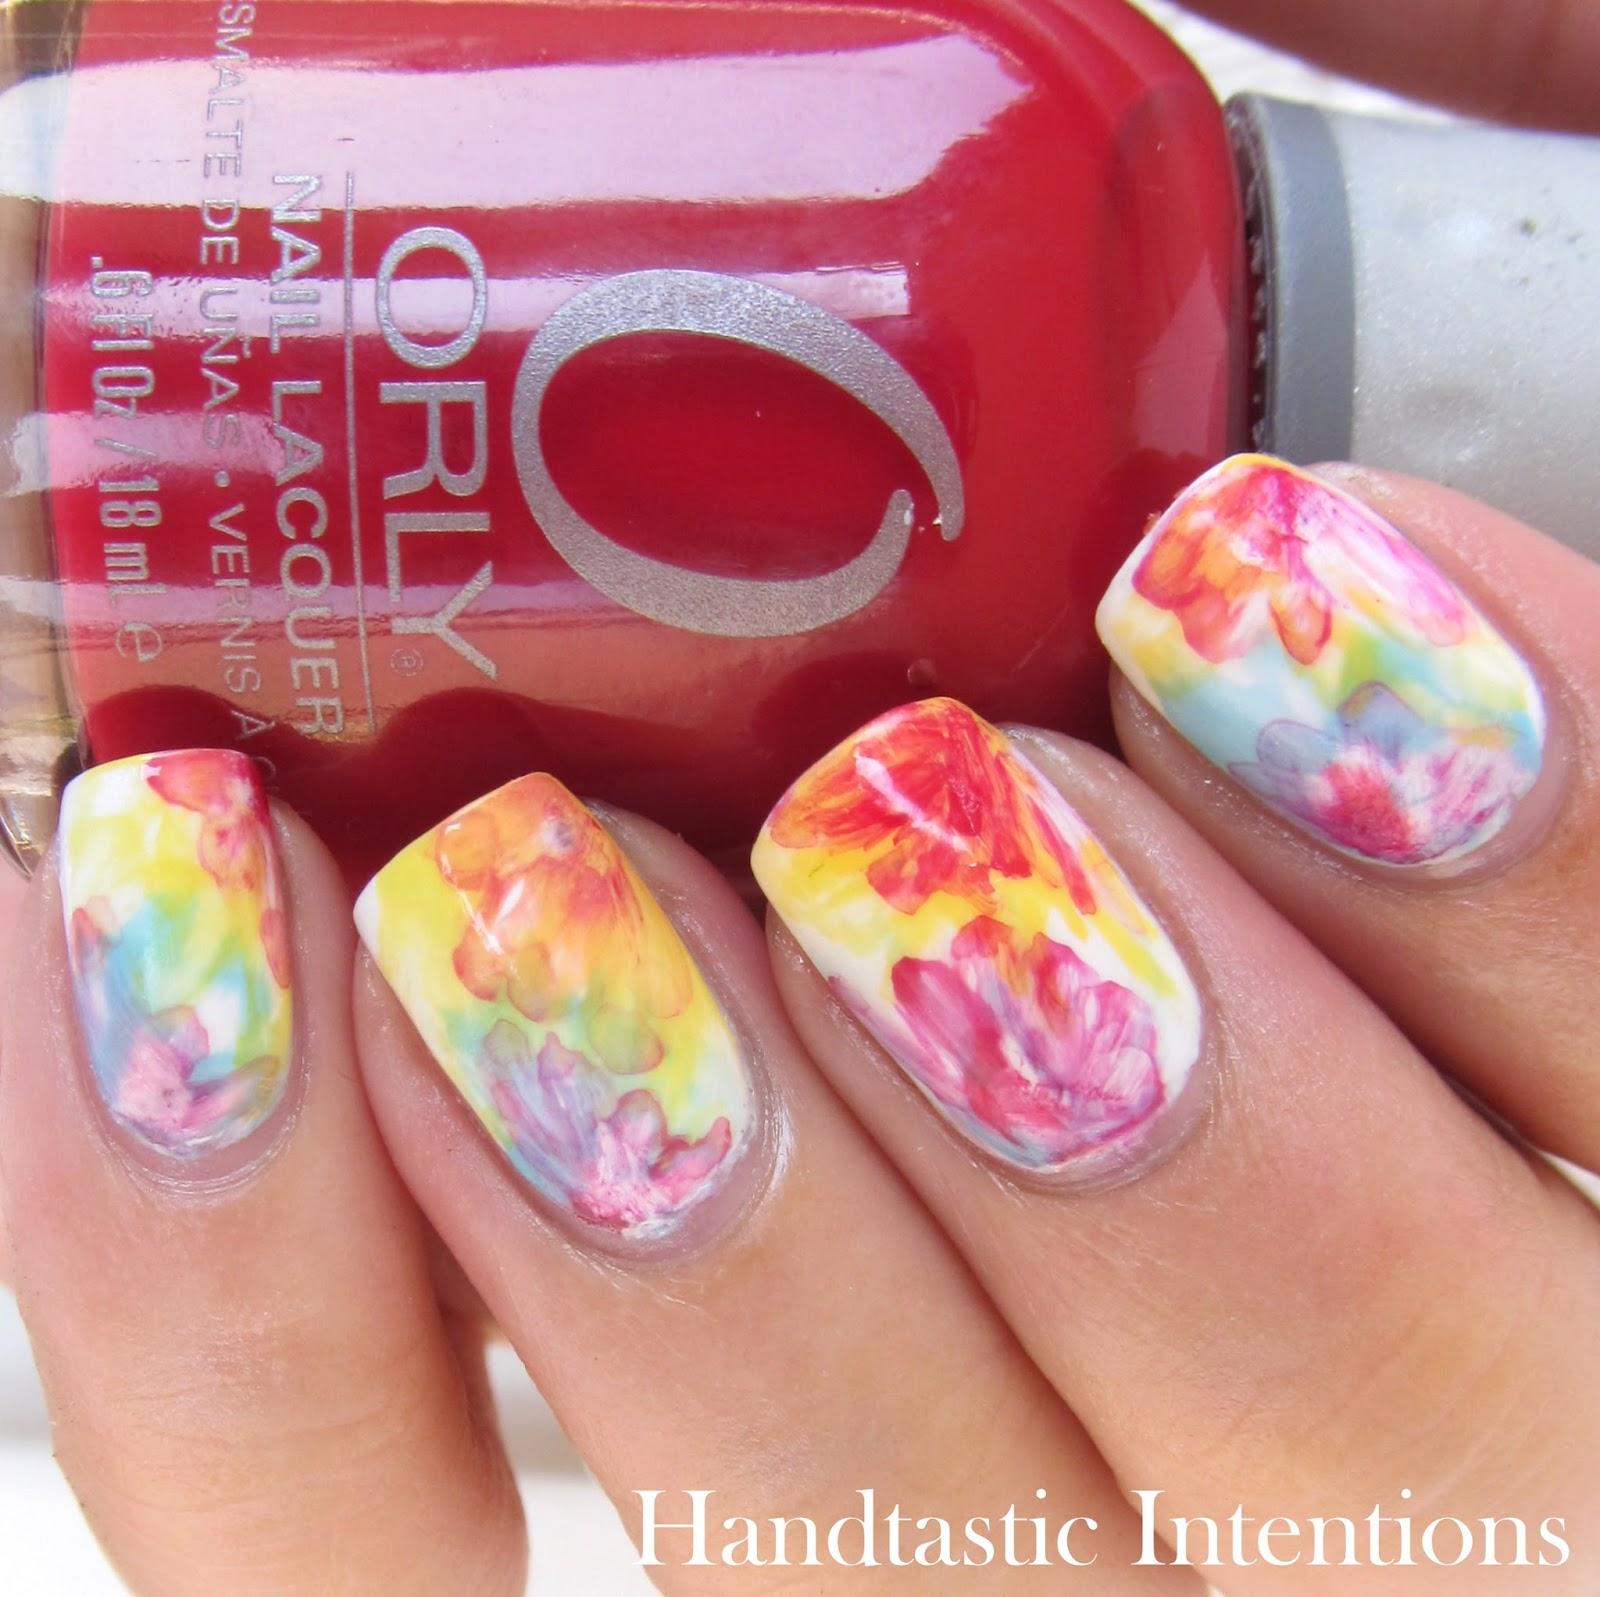 Handtastic Intentions: Nail Art: Watercolor Flowers Tri